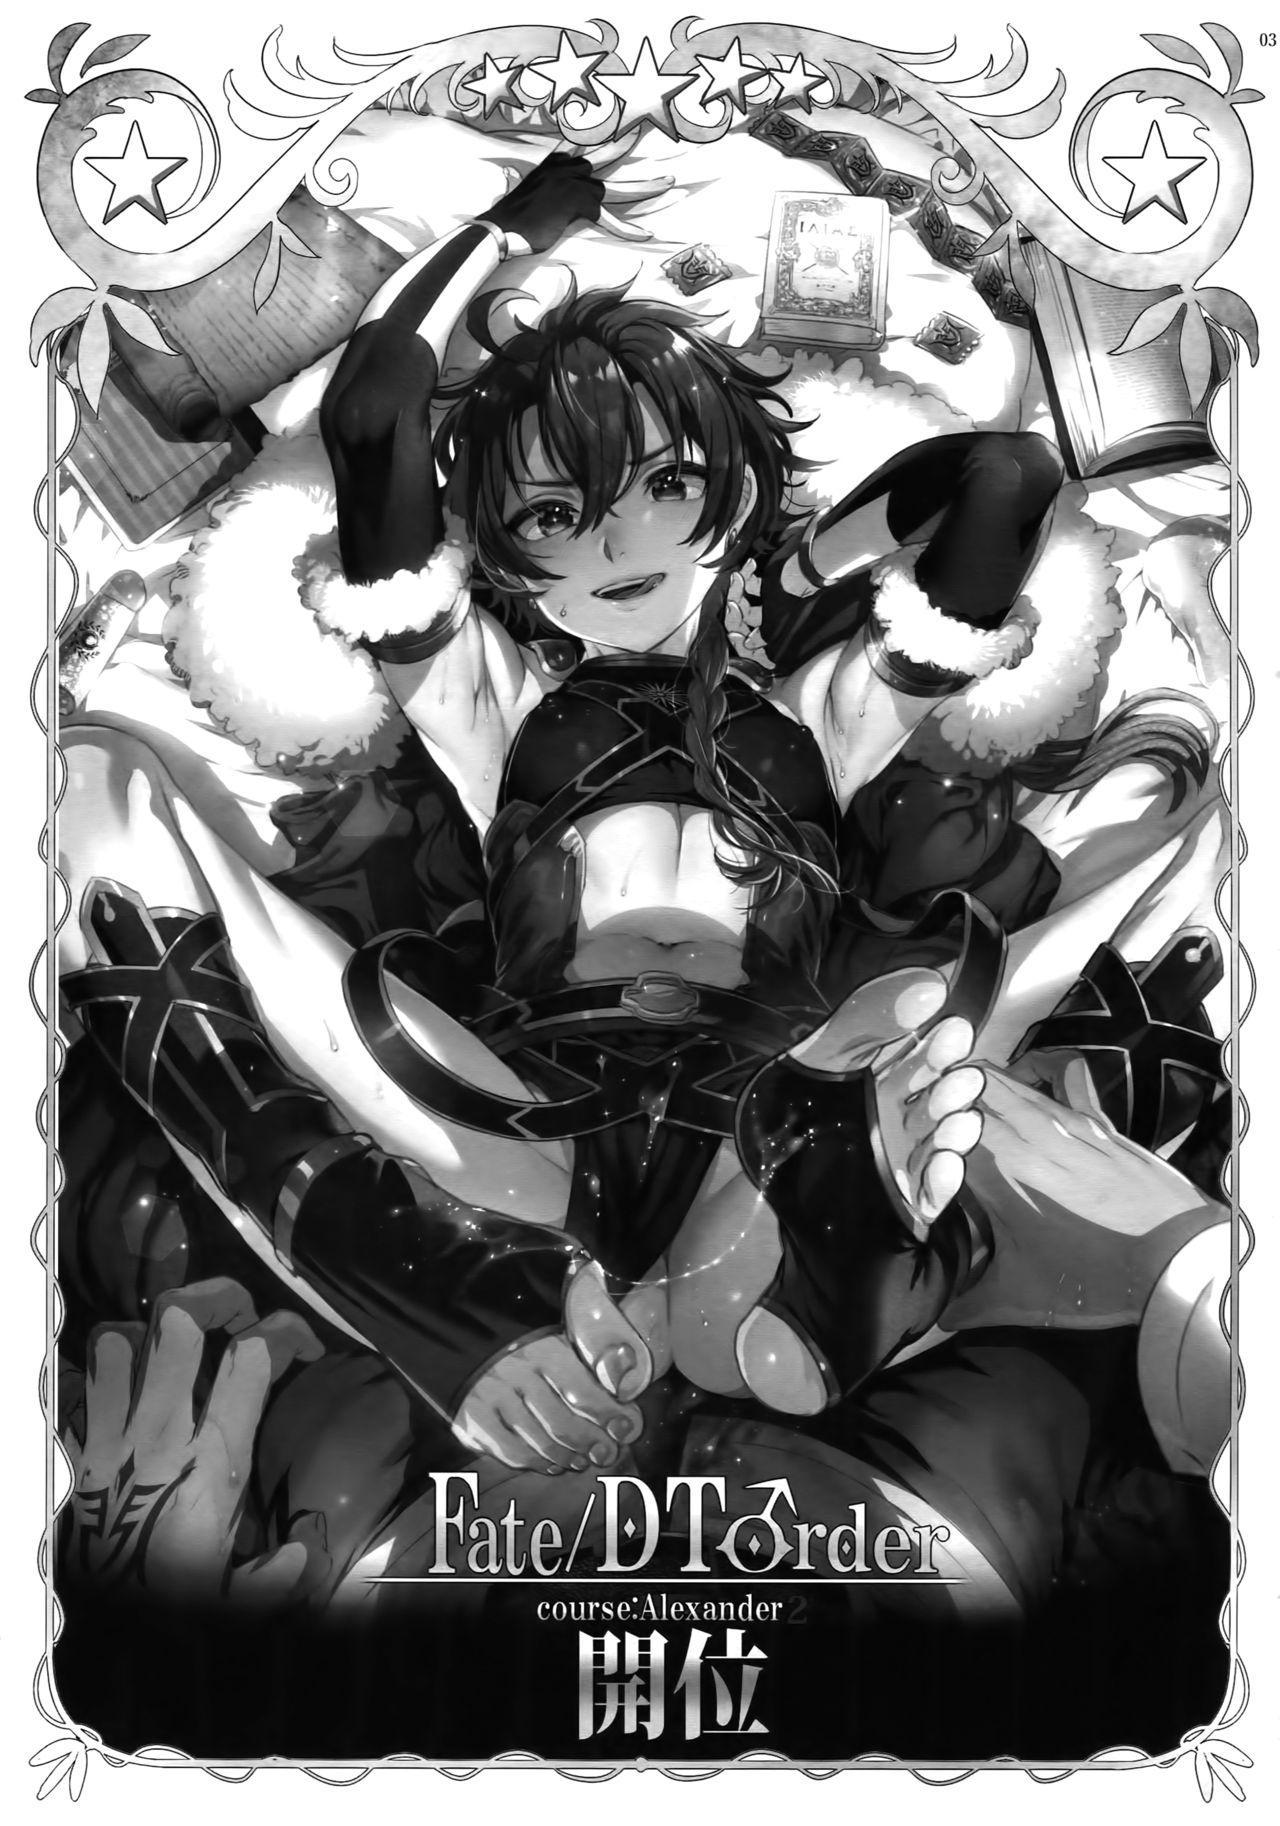 Fate/DT♂rder Hiraki 1